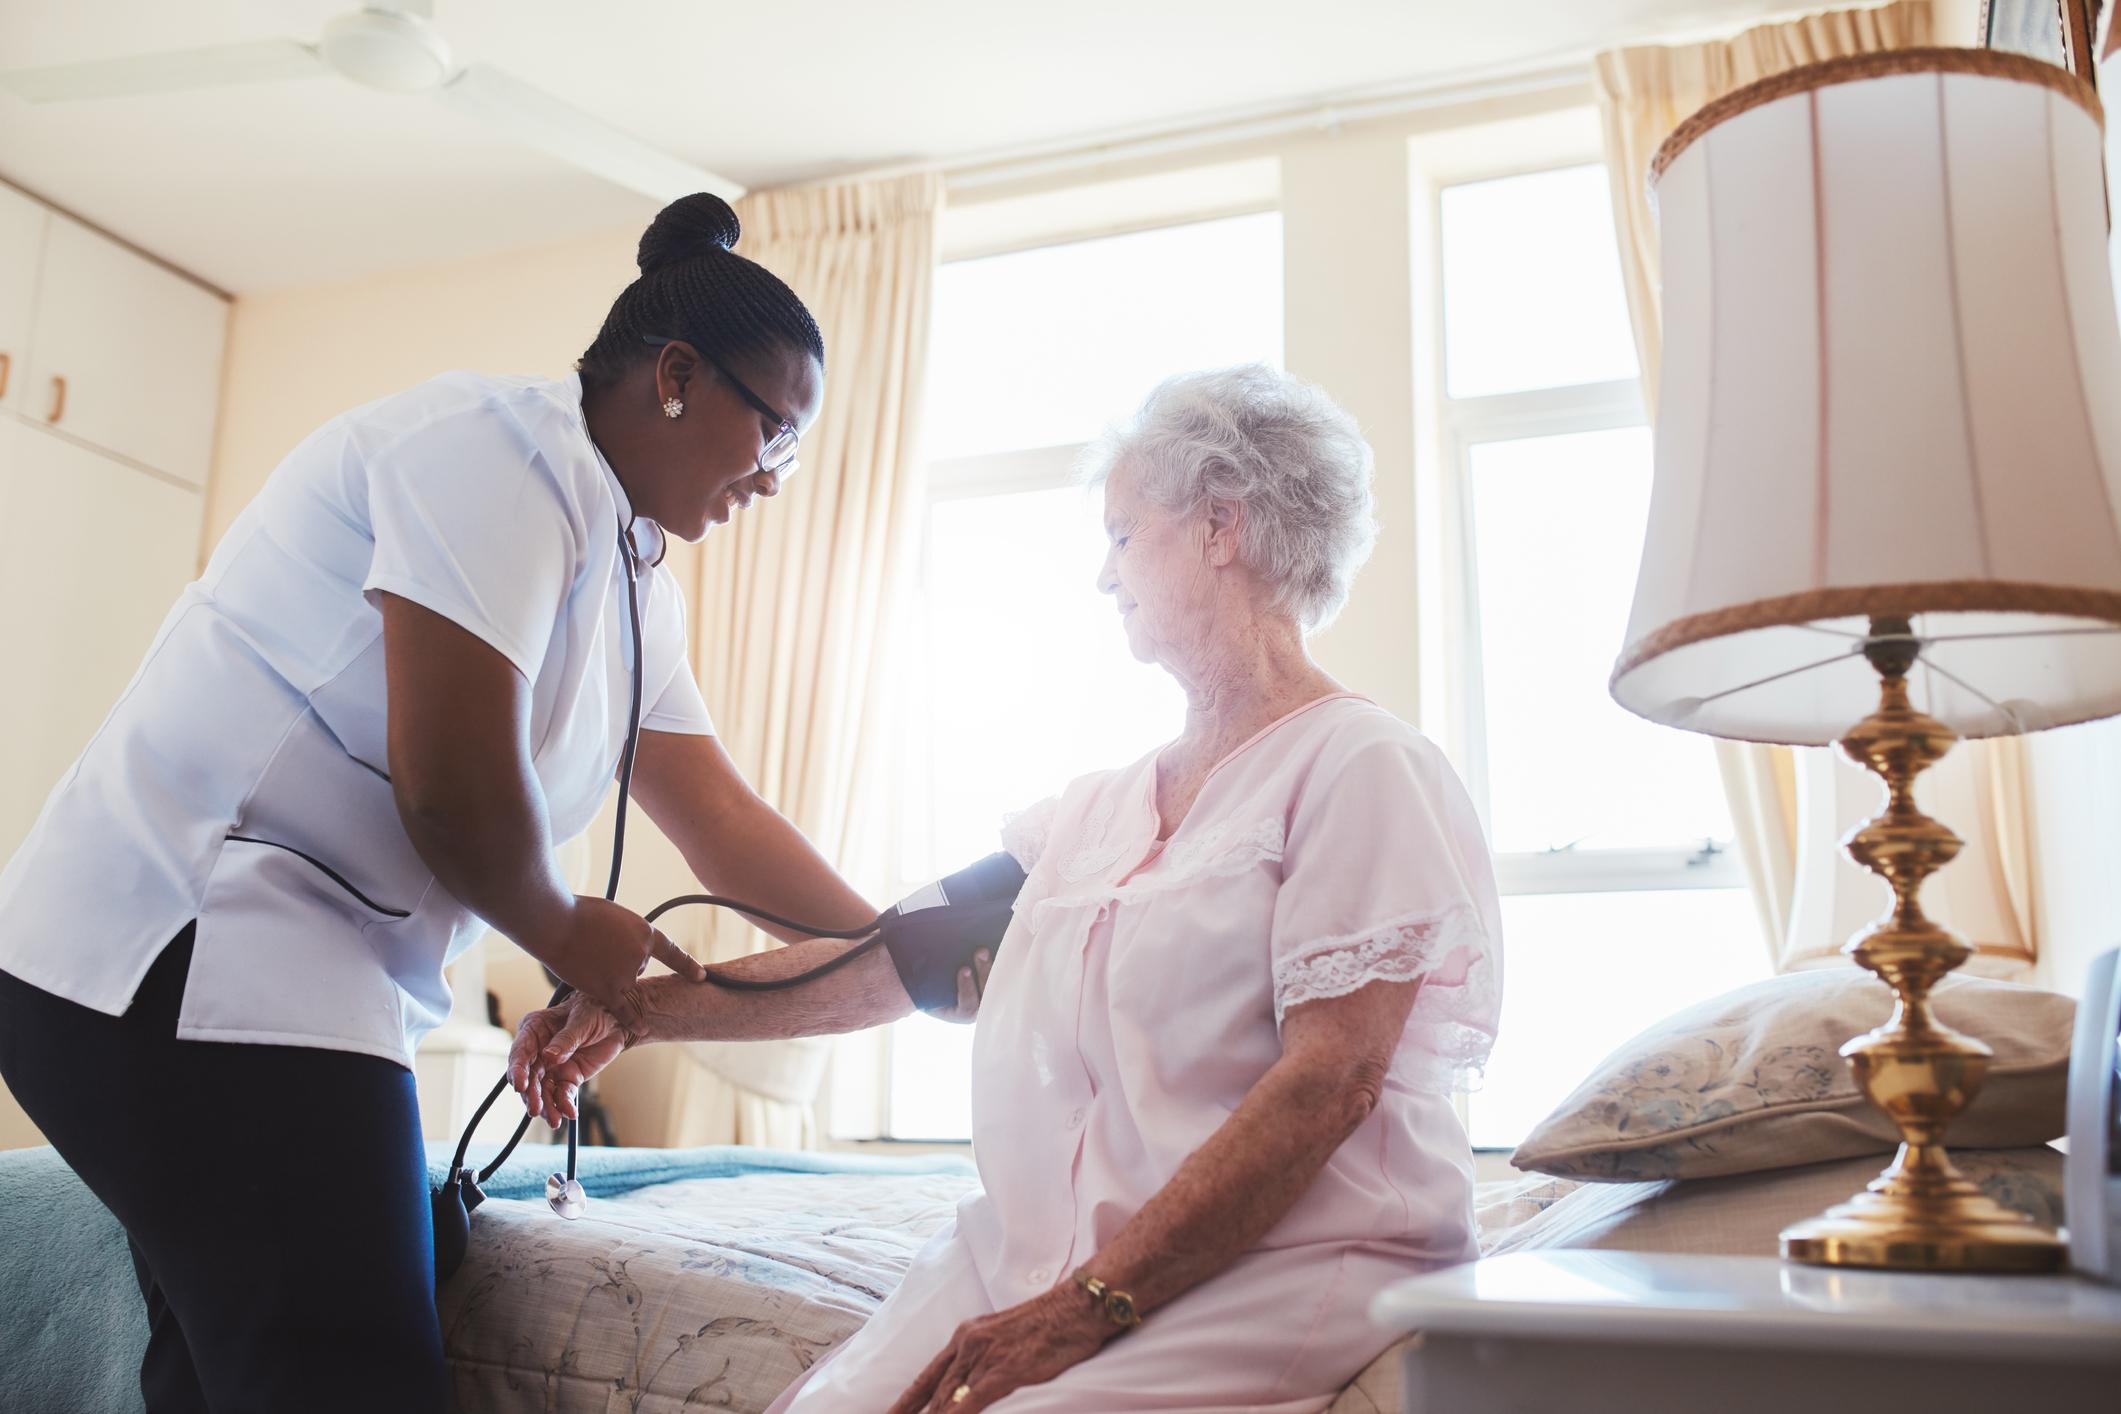 Nurse treating elderly patient in senior housing facility.